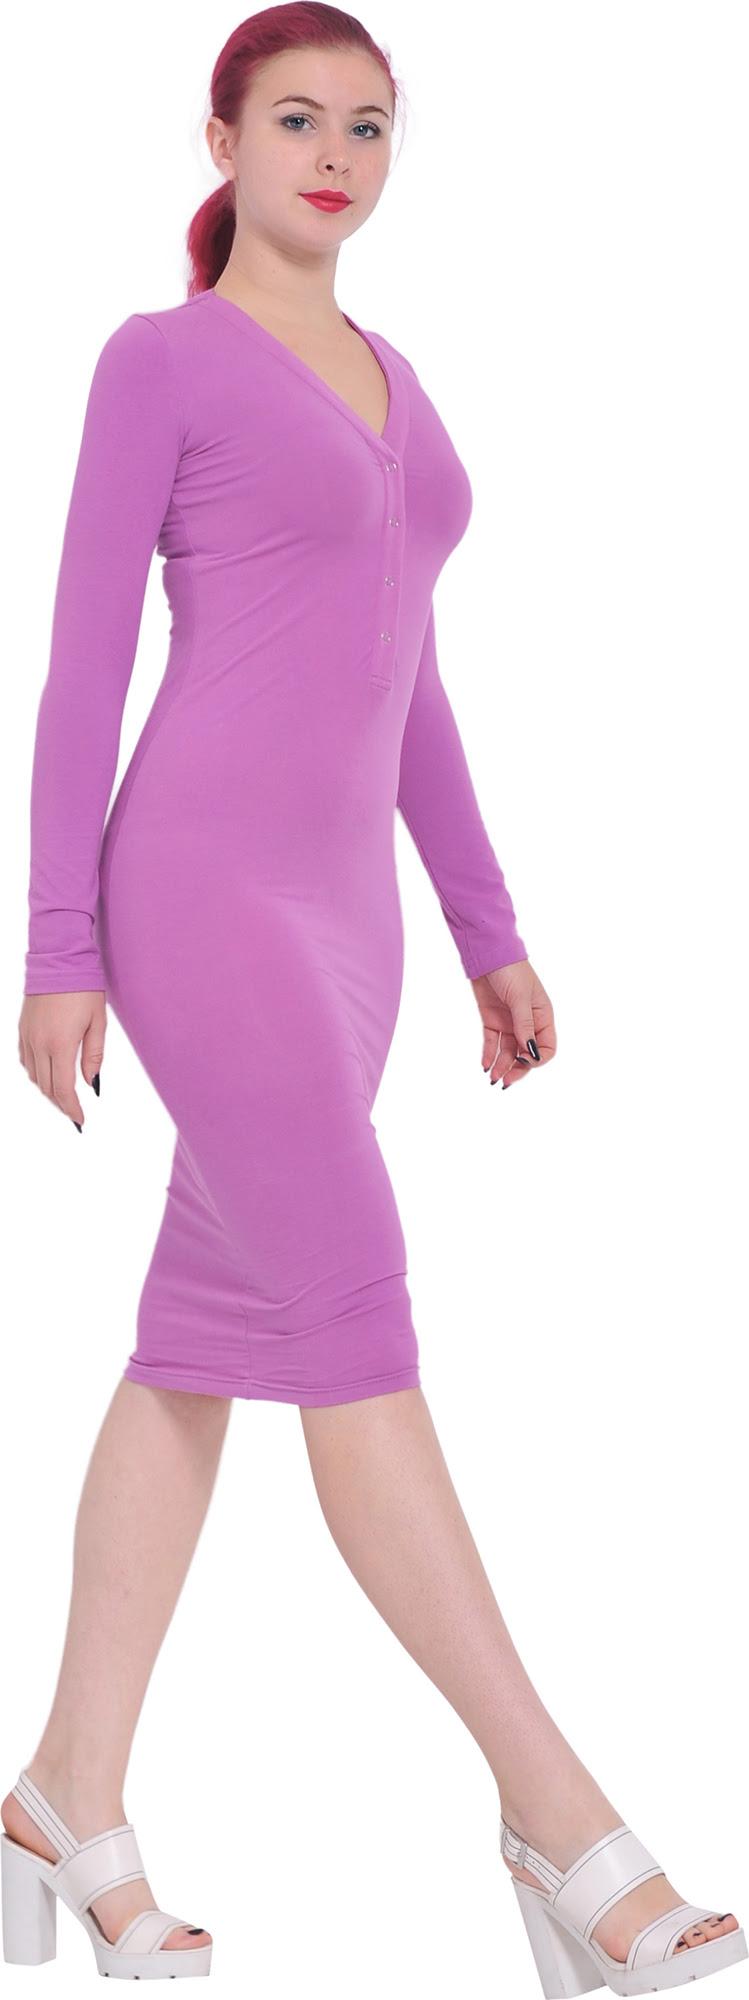 Bodycon dresses tea long plus length size cute for